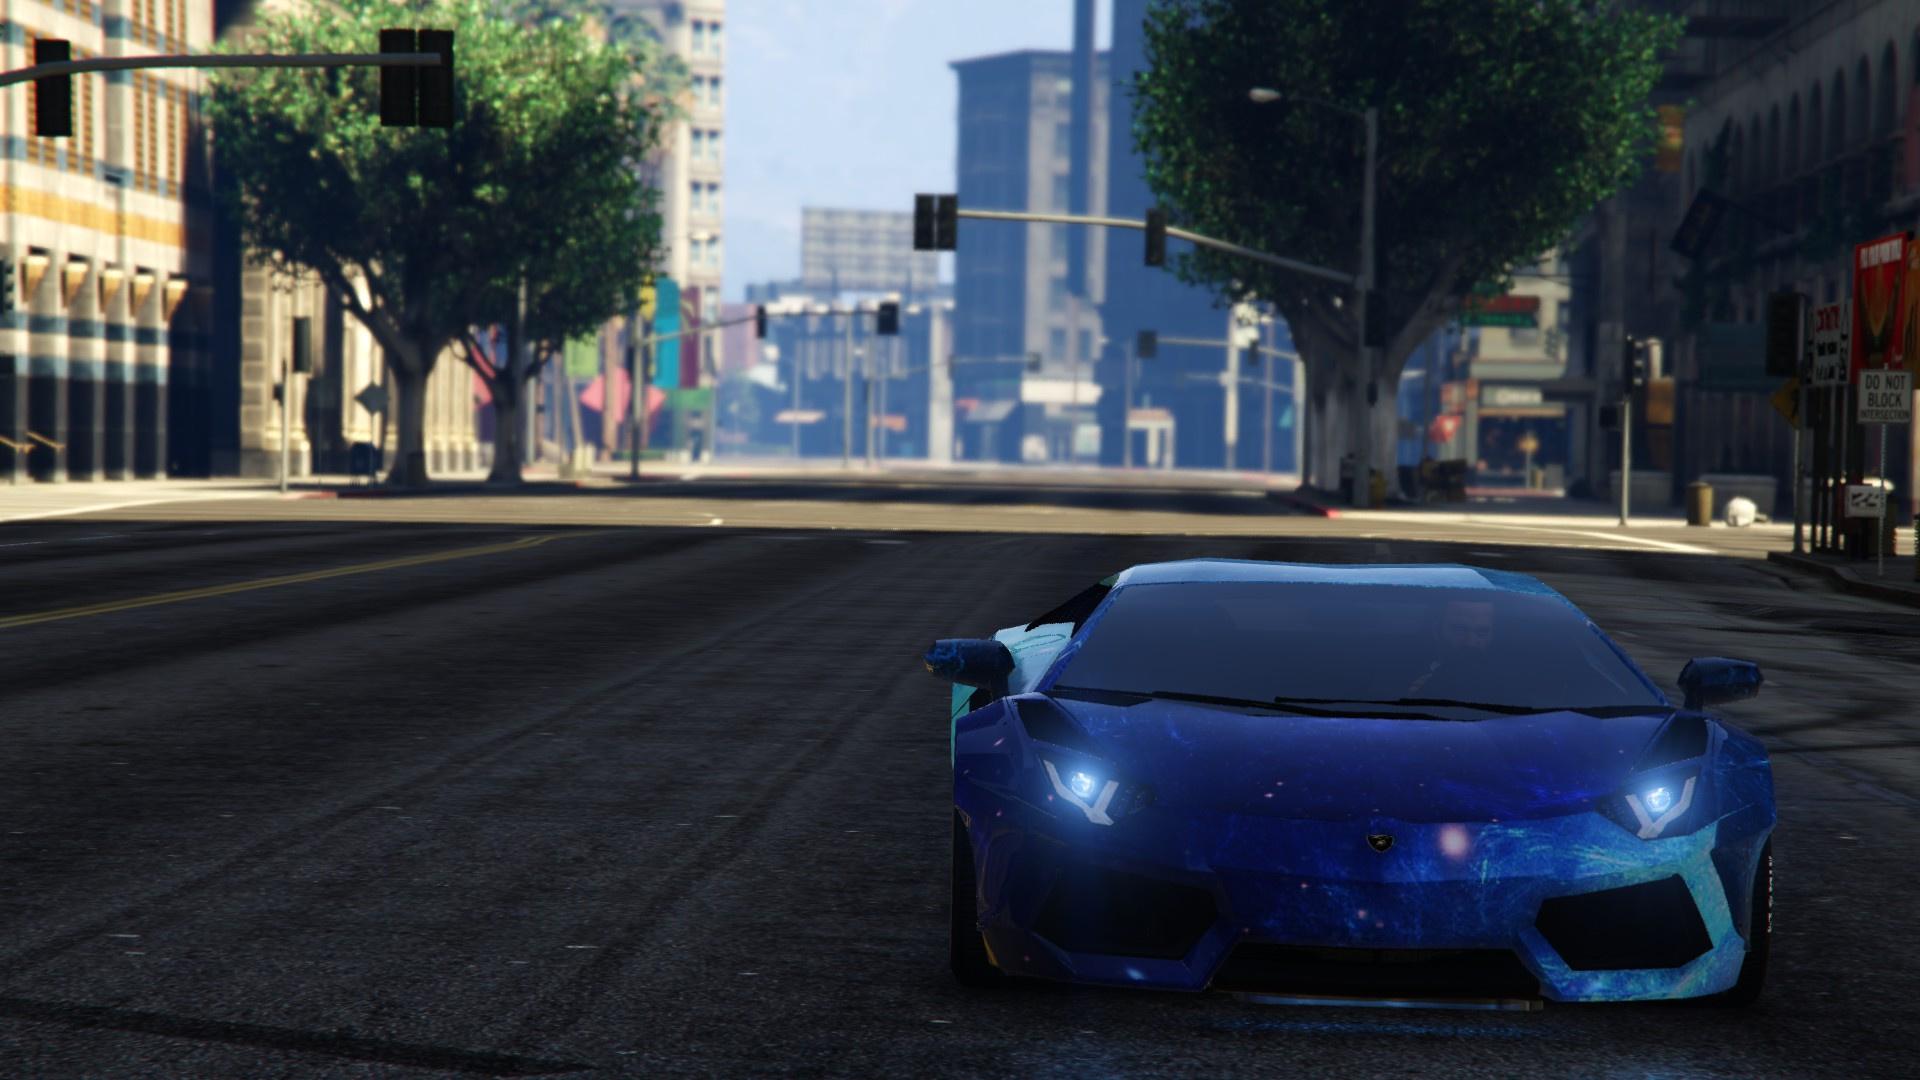 Blue Galaxy Livery For Lamborghini Aventador Liberty Walk Gta5